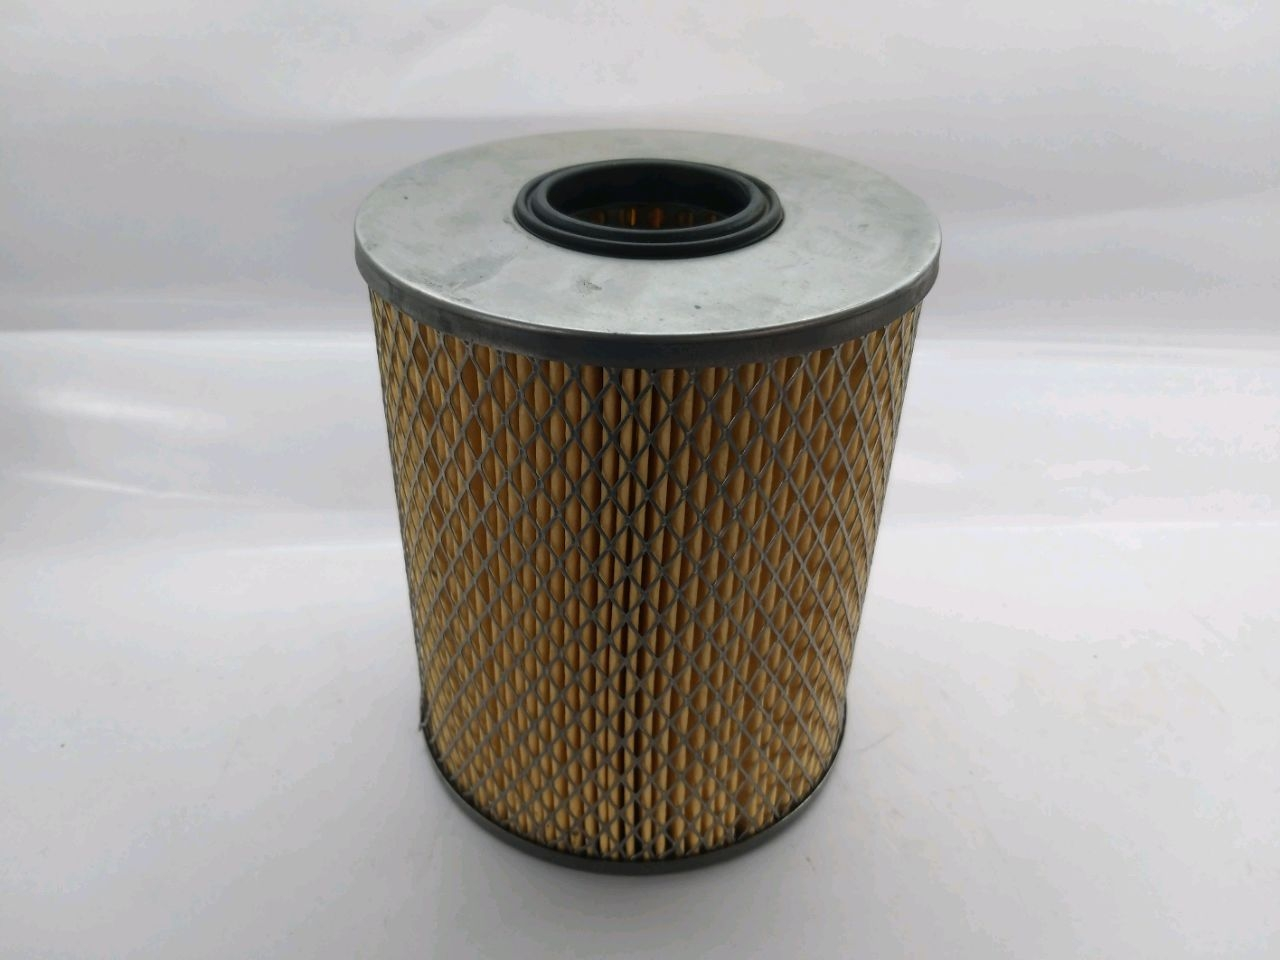 Filtru de ulei EO-54*2621 (Motorex)